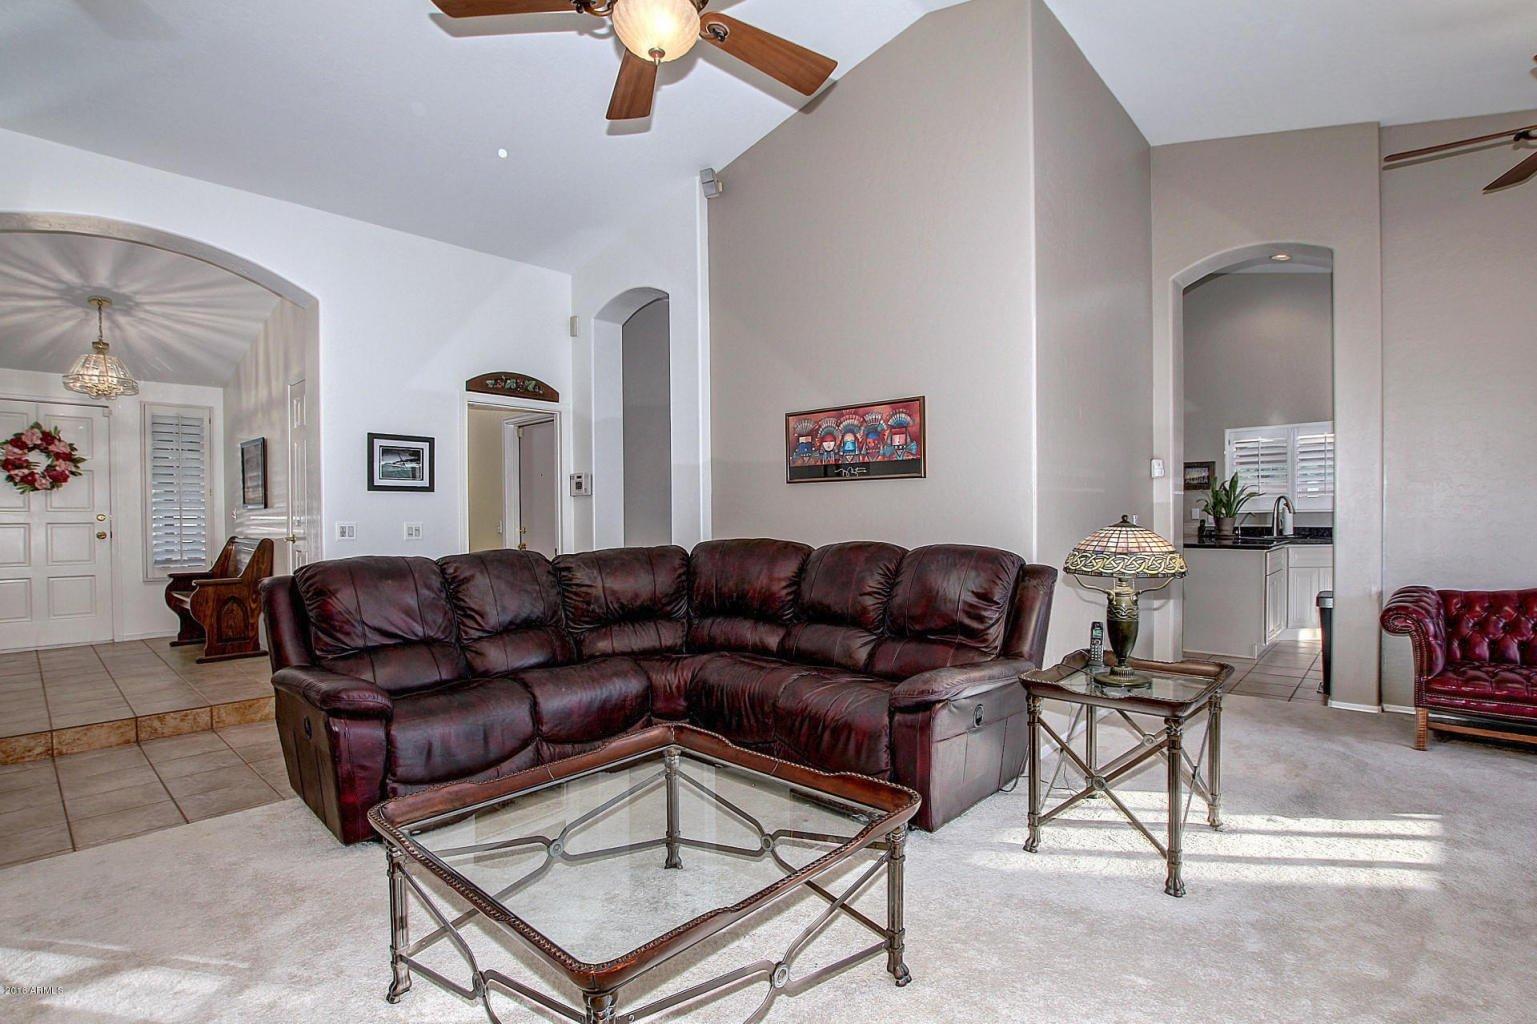 Photo 6: Photos: 3602 E Mountain Sky Avenue in Phoenix: Ahwatukee House for sale : MLS®# 5462780